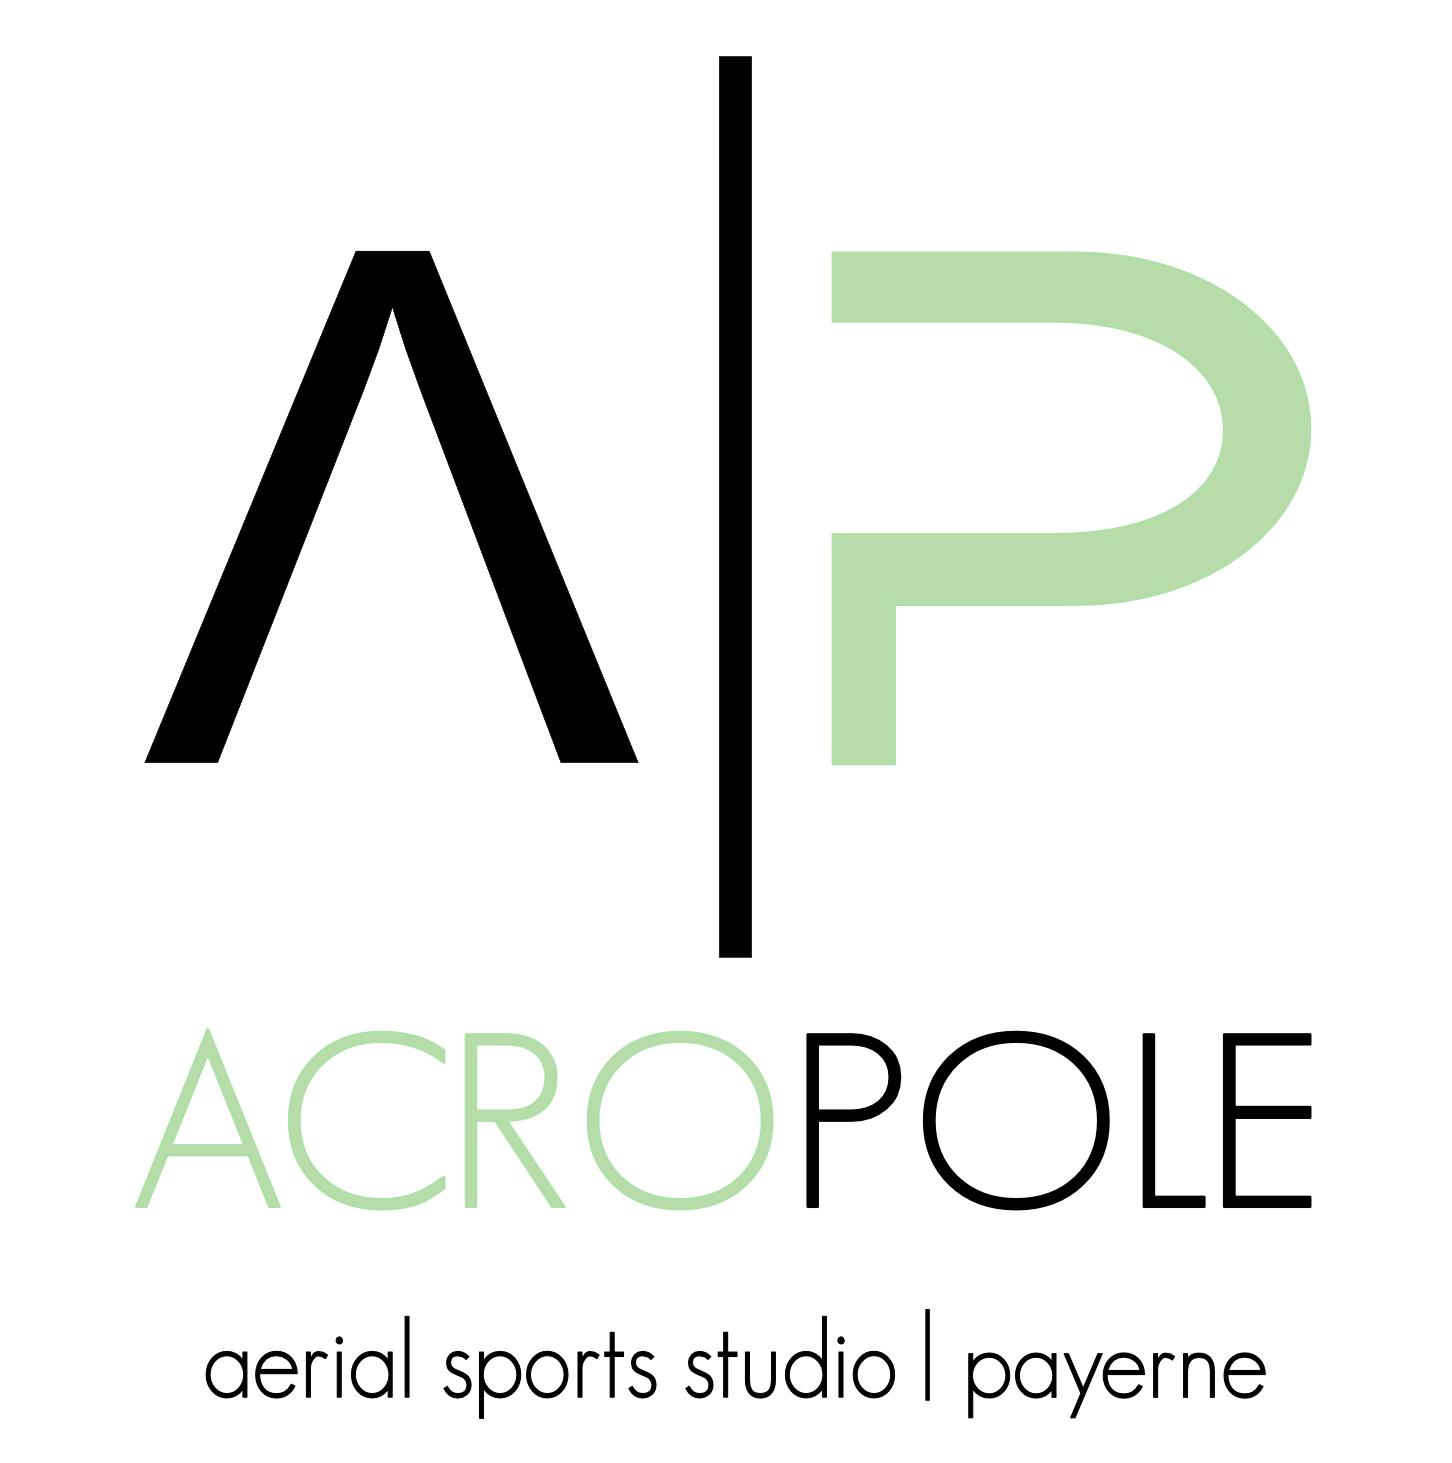 Acropole Studio | Payerne